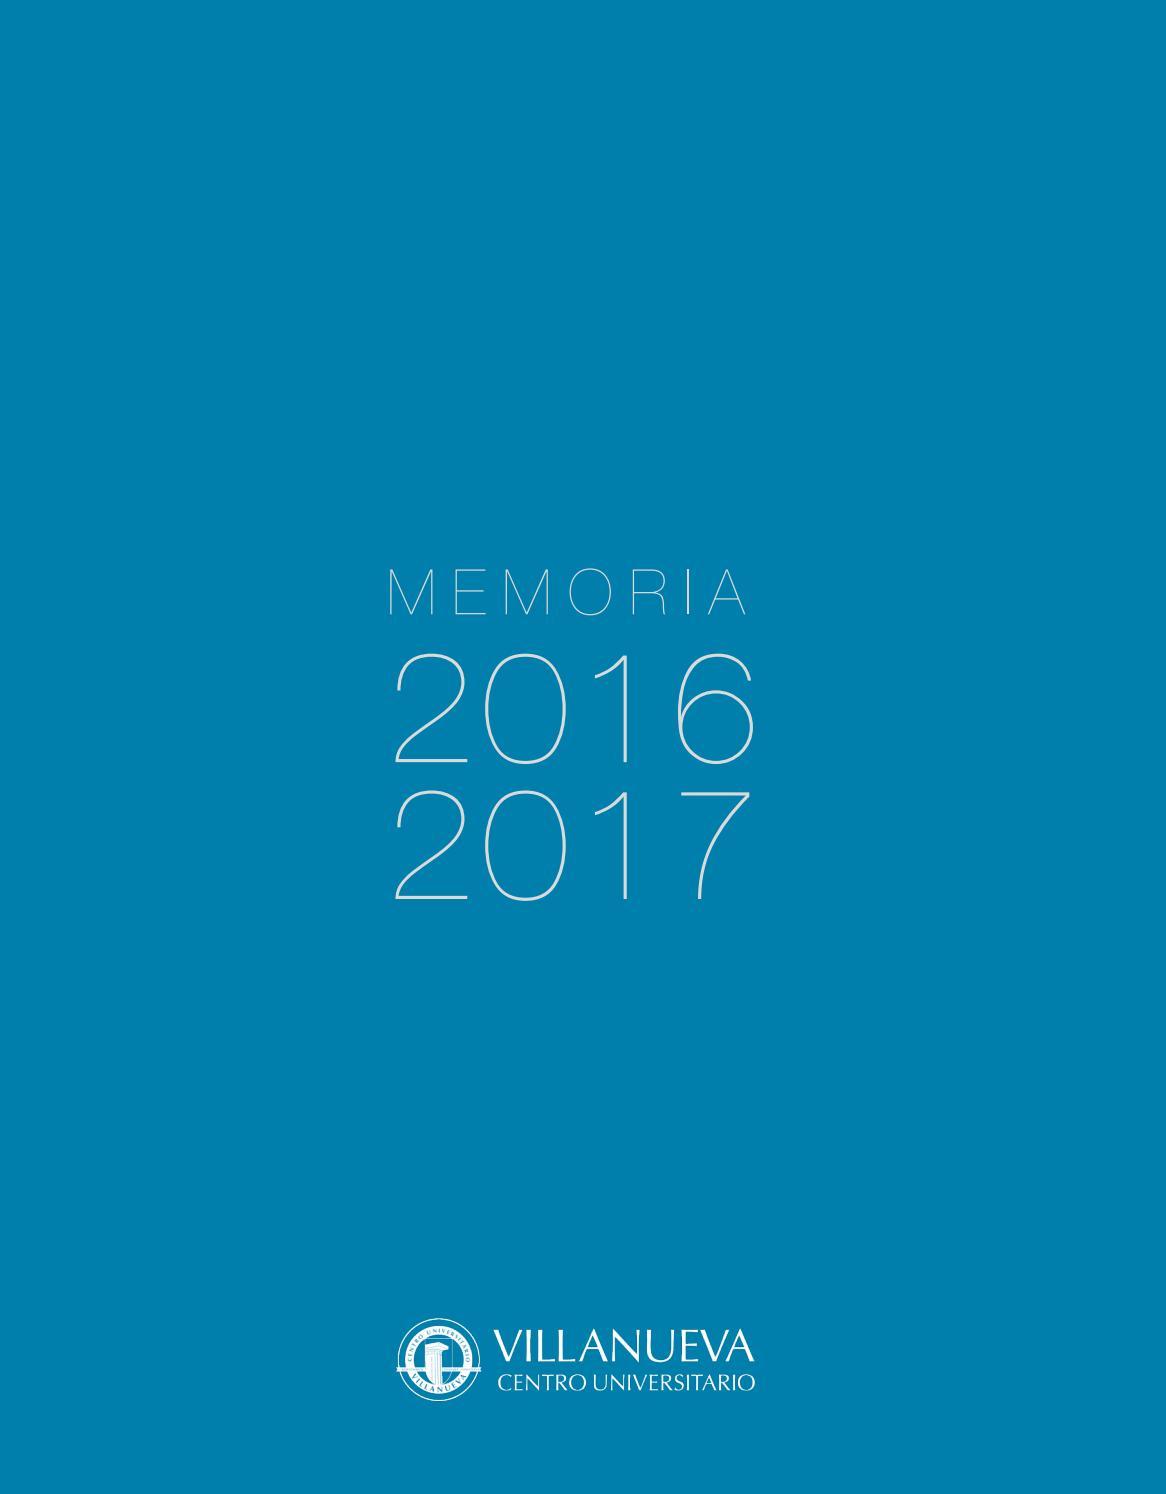 Memoria académica 16 17 by Villanueva Centro Universitario - issuu